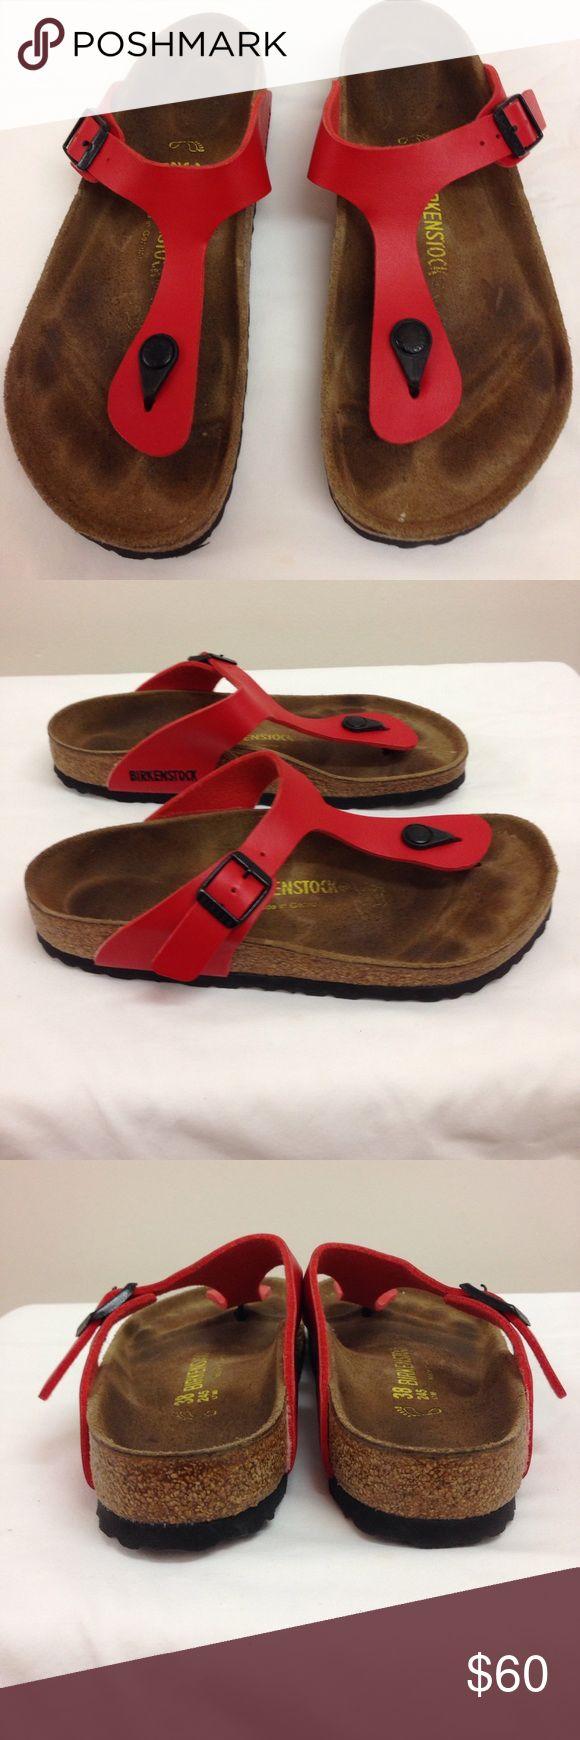 NEW LISTING Birkenstock Sandals Red. Show signs of wear. Size 8/38.  (6/2) Birkenstock Shoes Sandals